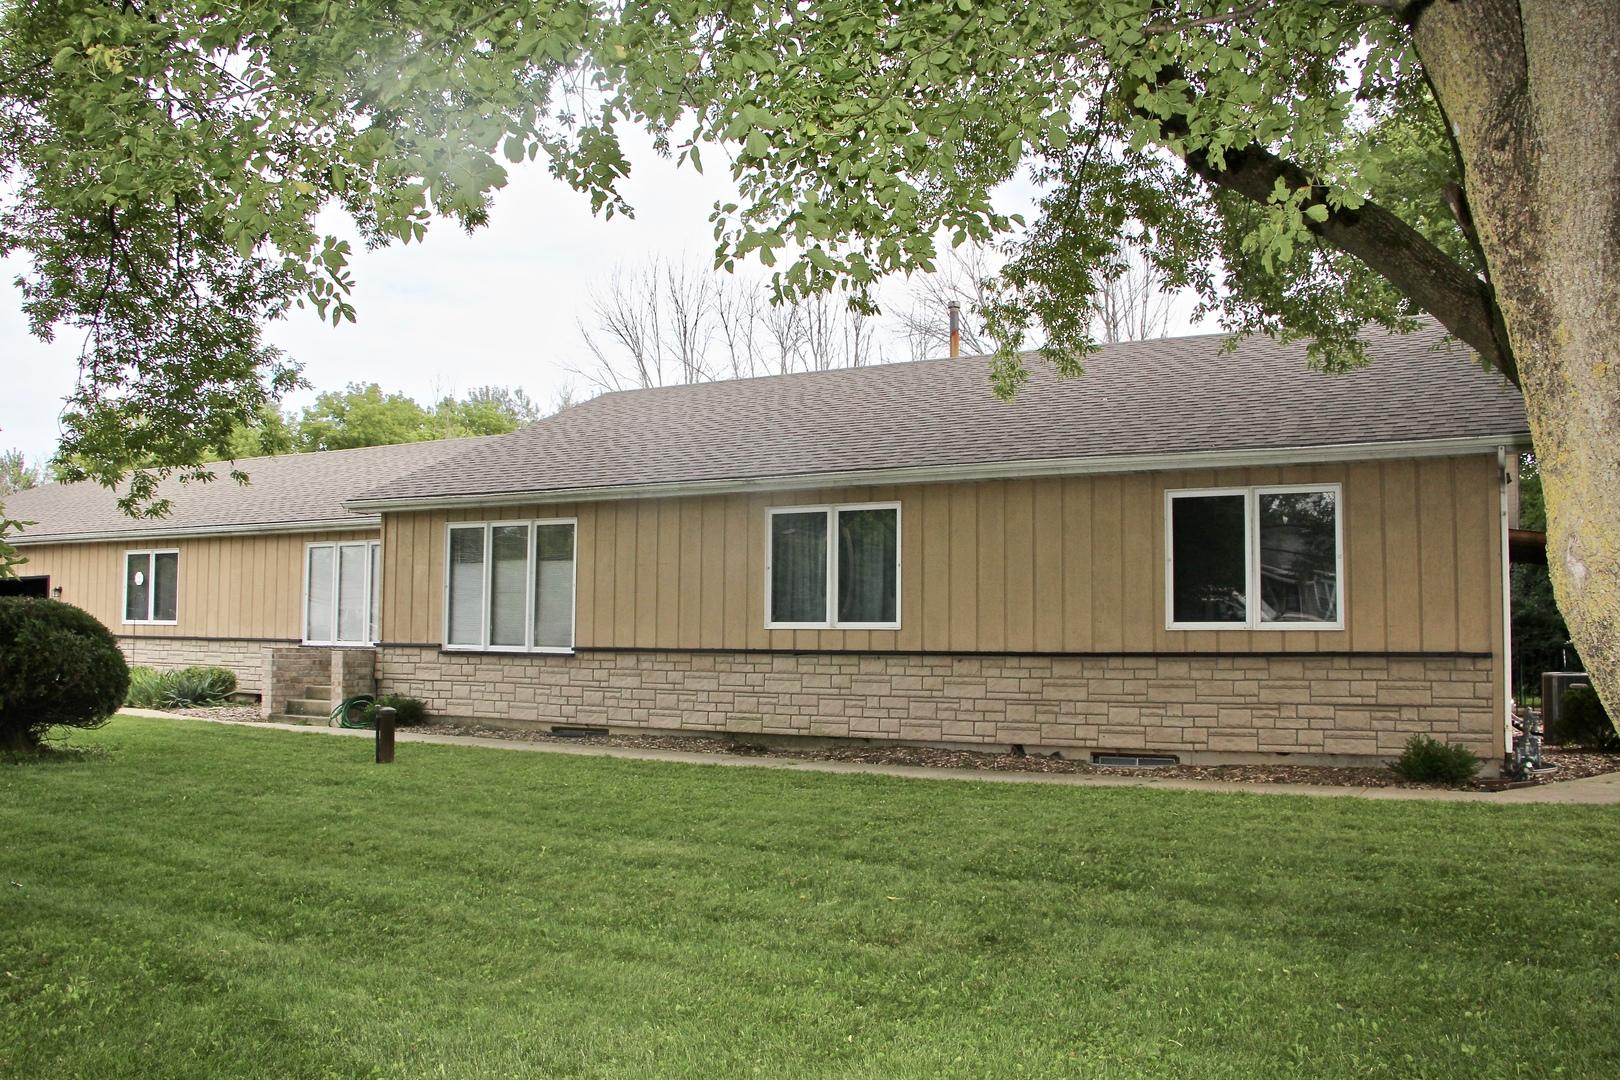 12285 W Yorkhouse Rd, Beach Park IL 60087